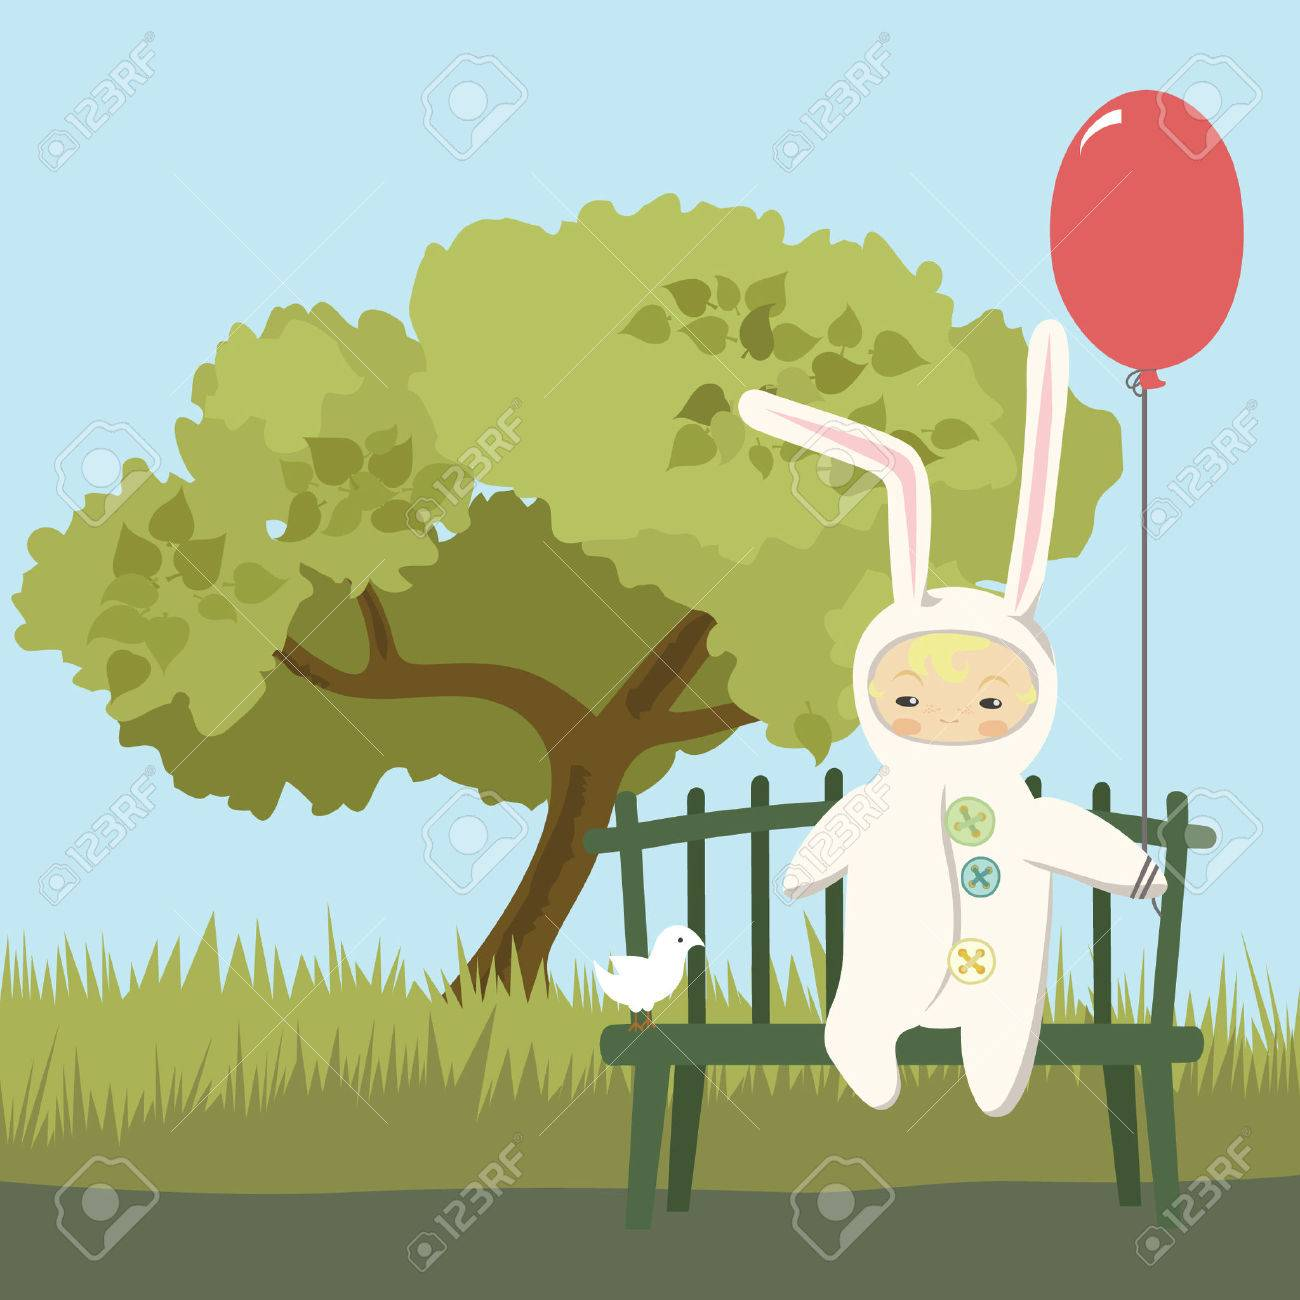 Small Child in Bunny Costume - 4757284